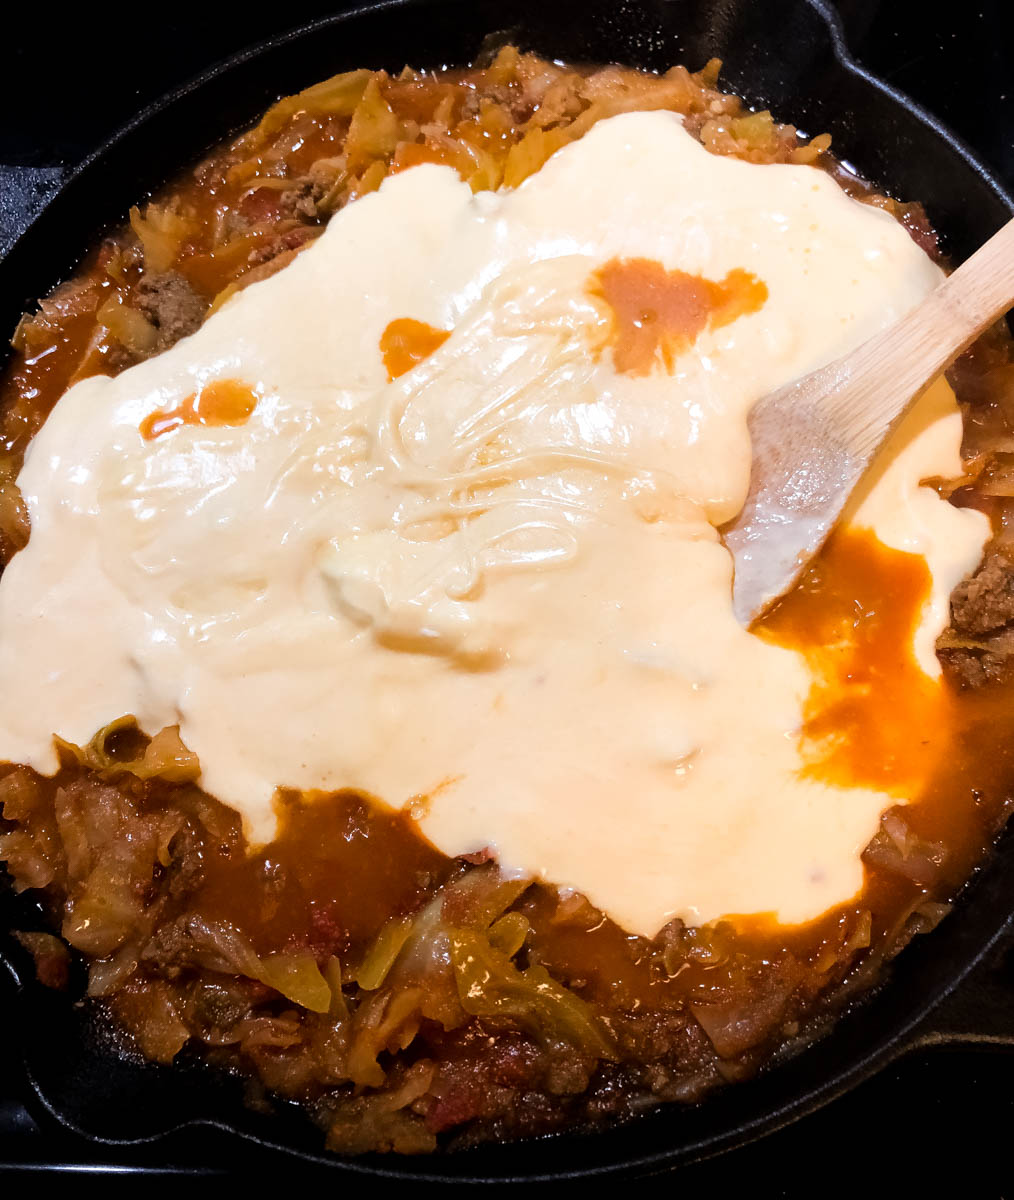 Cheesy sauce over skillet casserole.